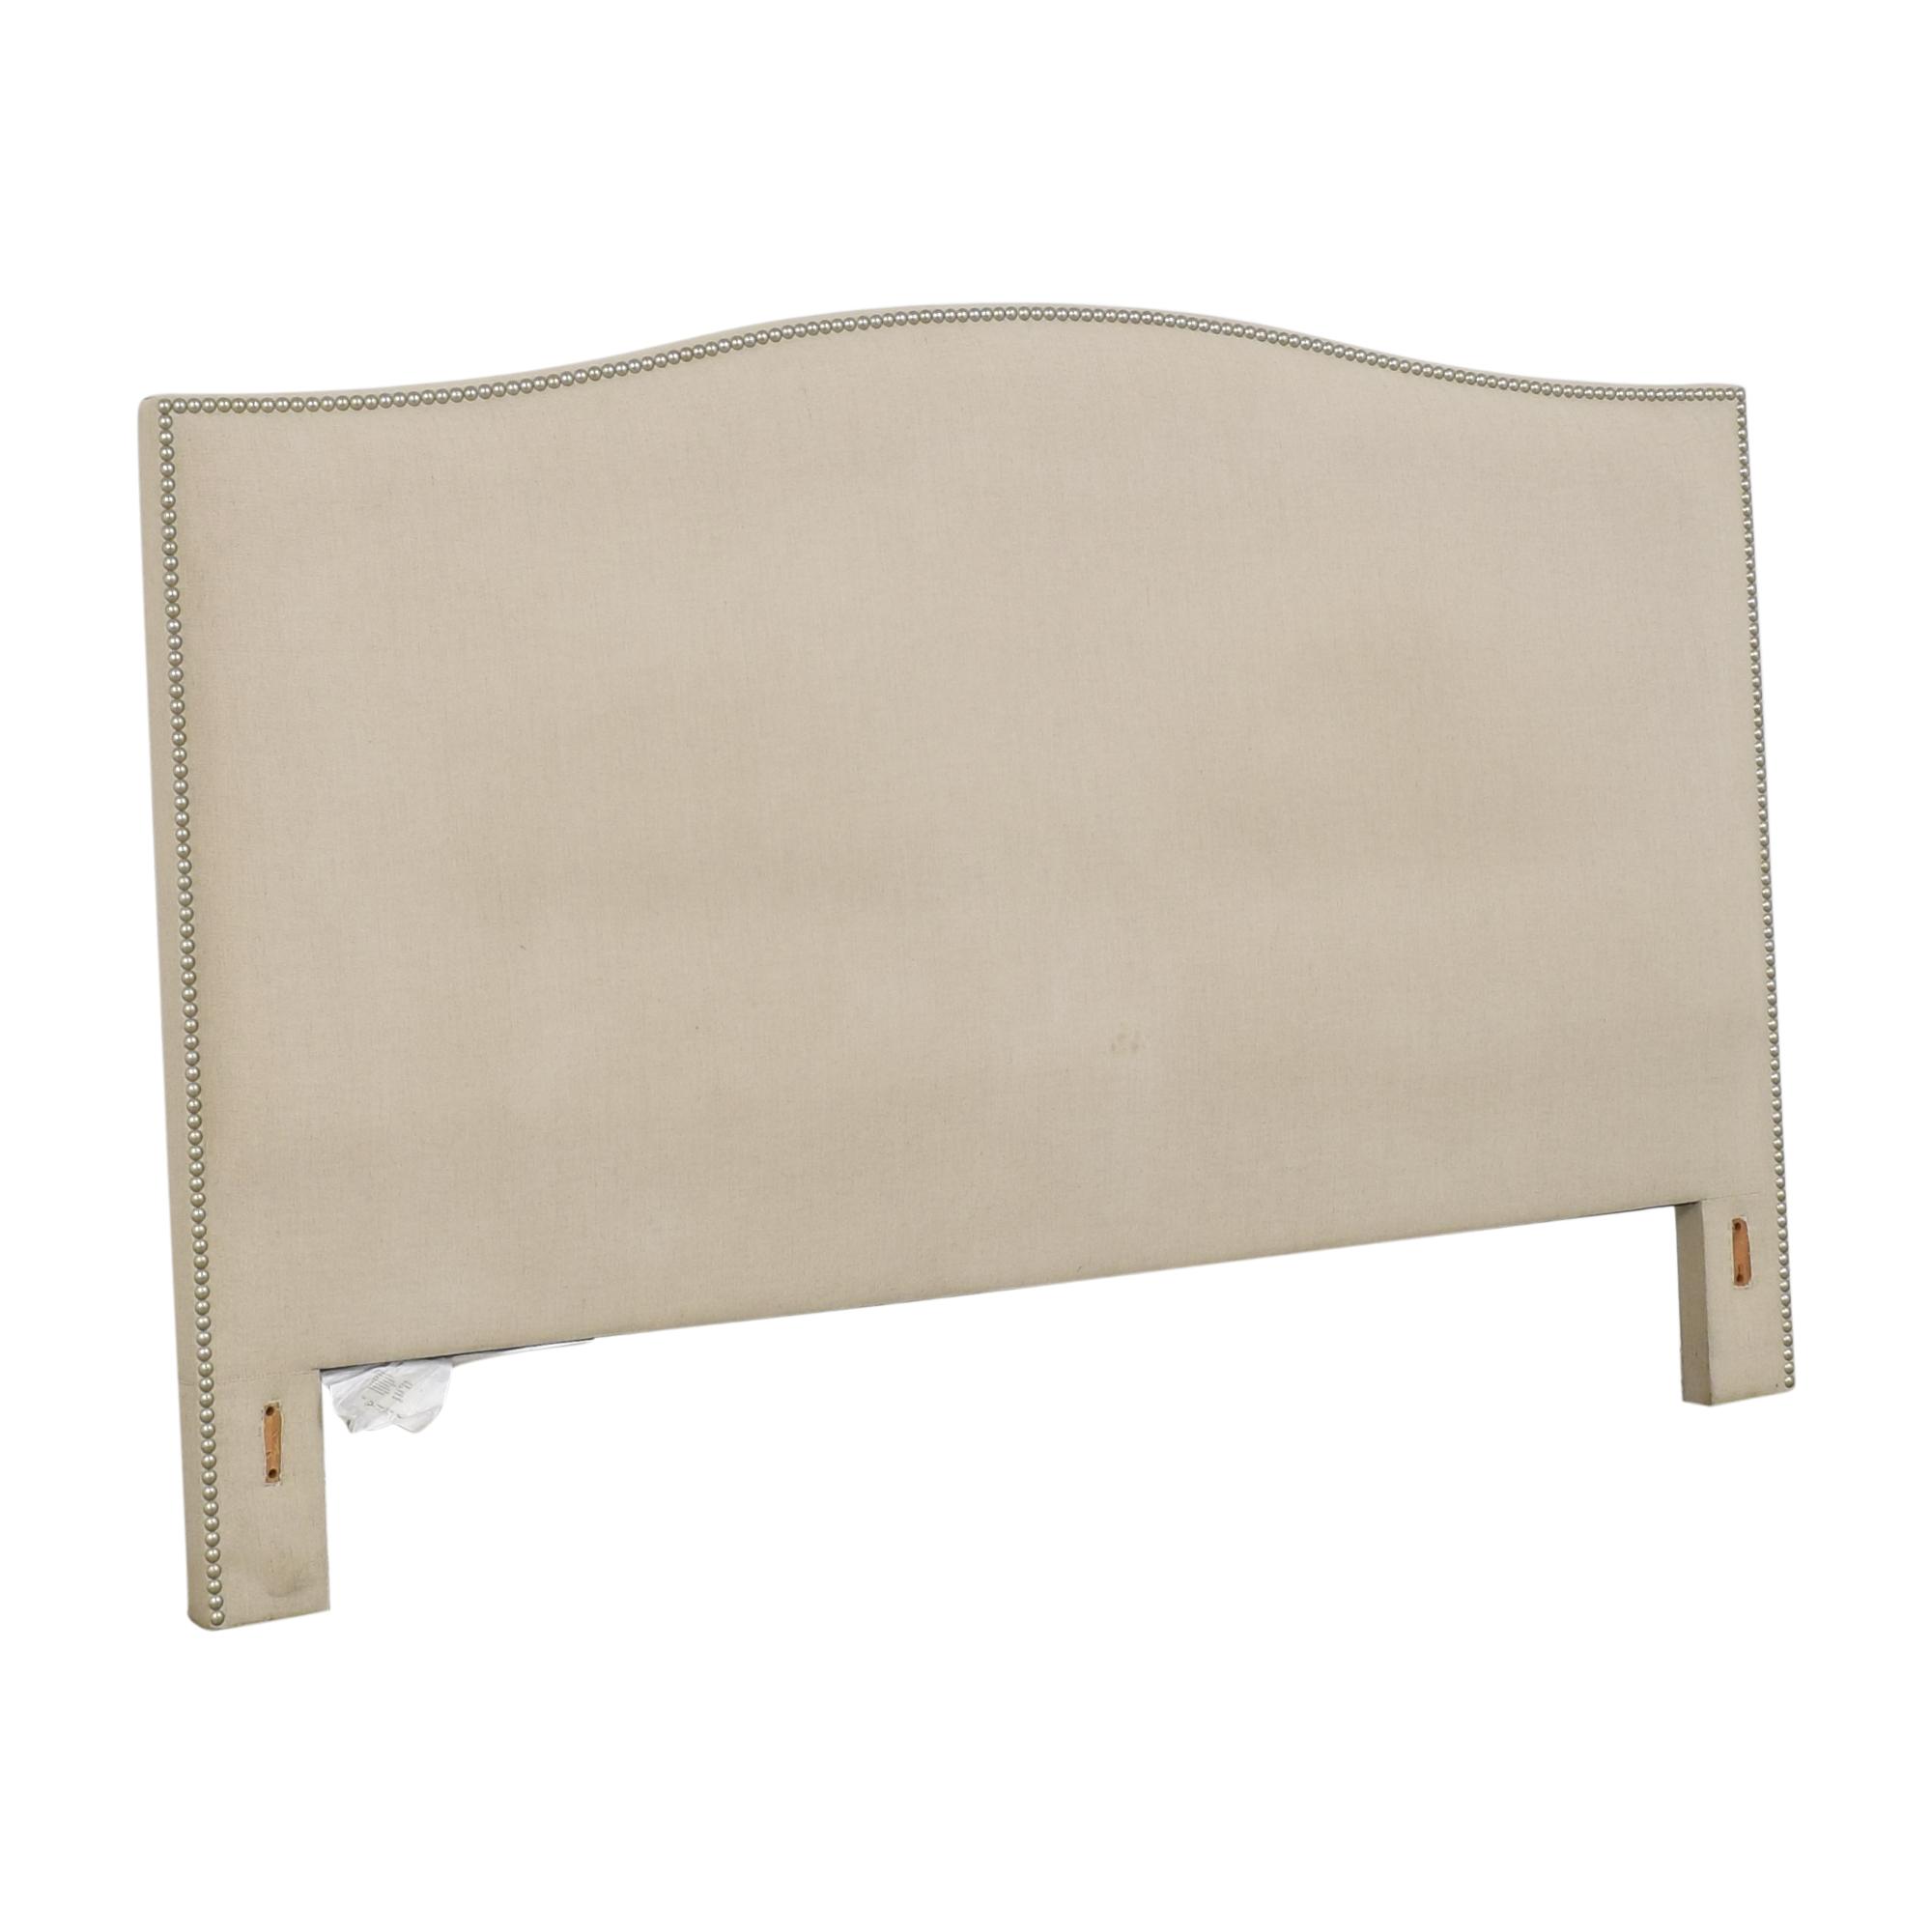 Crate & Barrel Crate & Barrel Colette Upholstered Nailhead King Headboard price